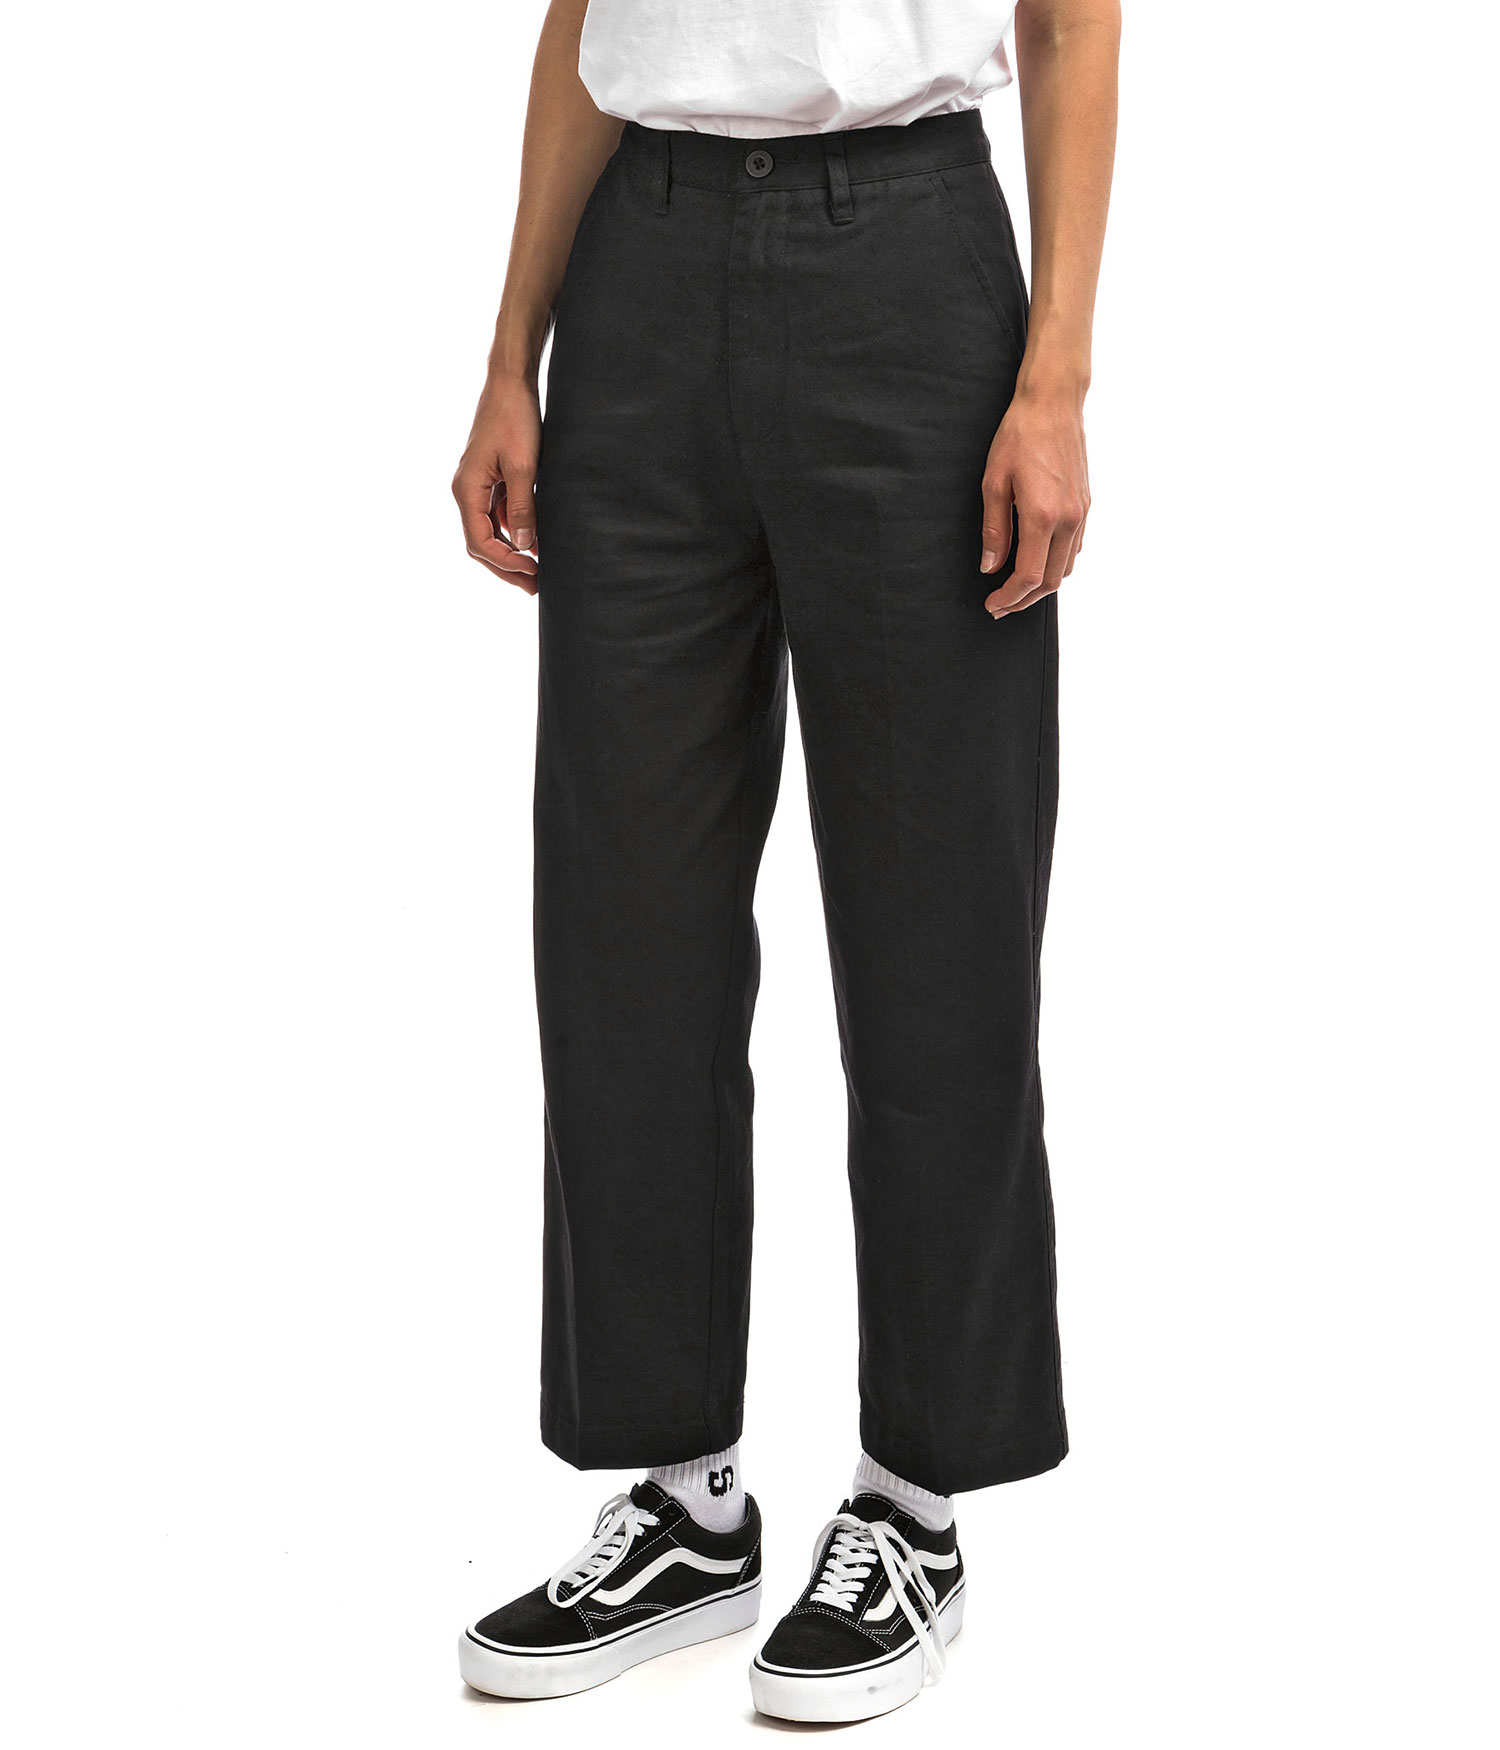 Womenblack Cruz Santa Pantalons Nolan Chino DeE2HW9IY